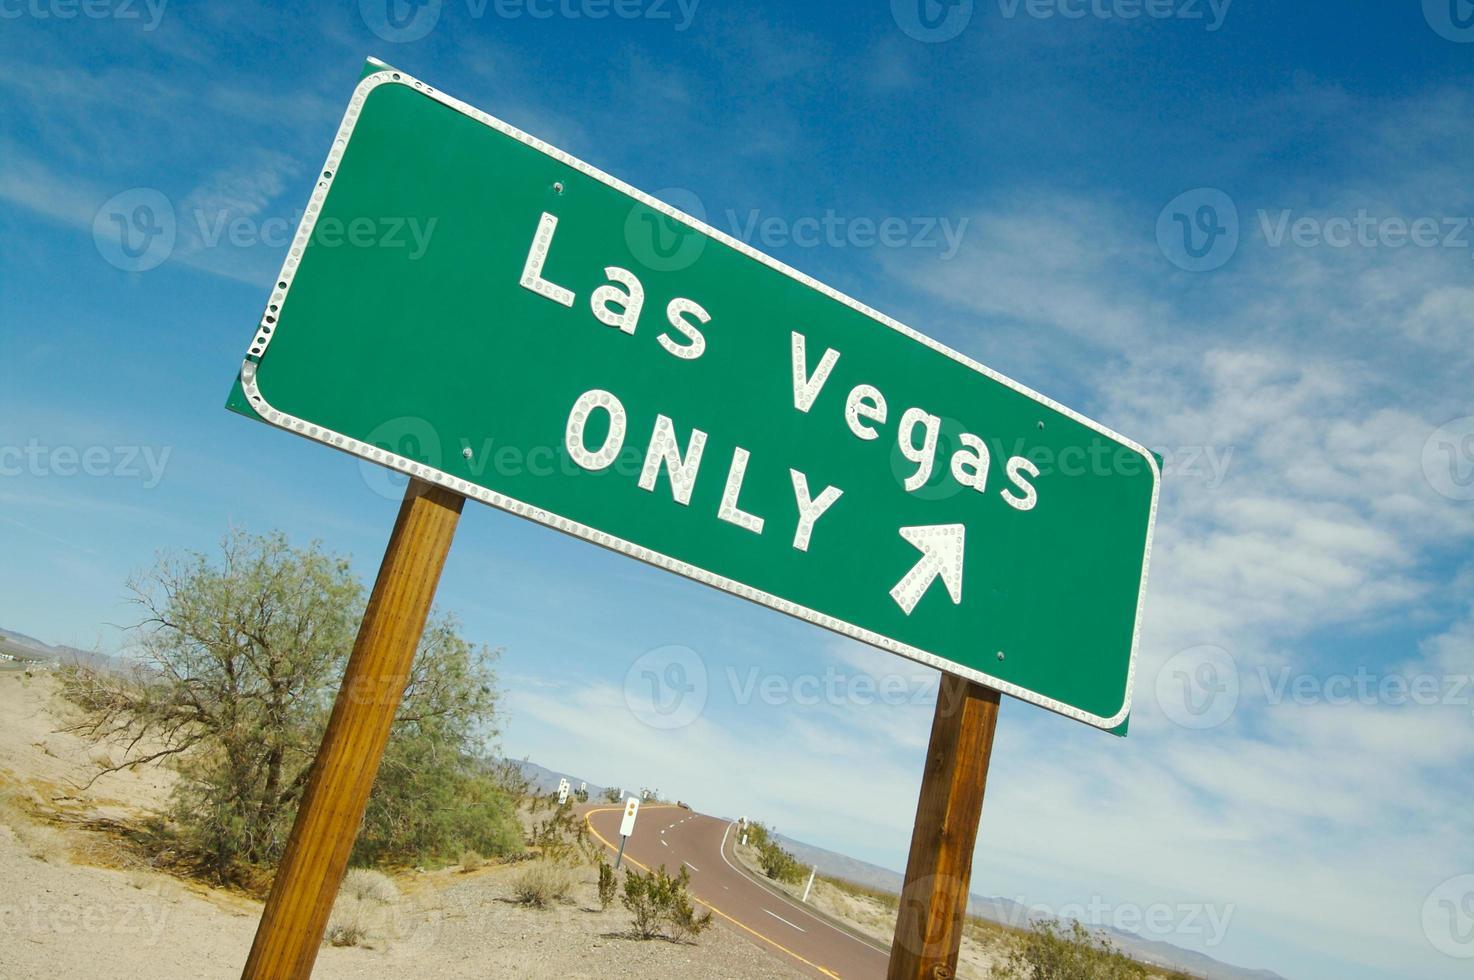 Las Vegas Sign Pointing to Fun - 3 photo